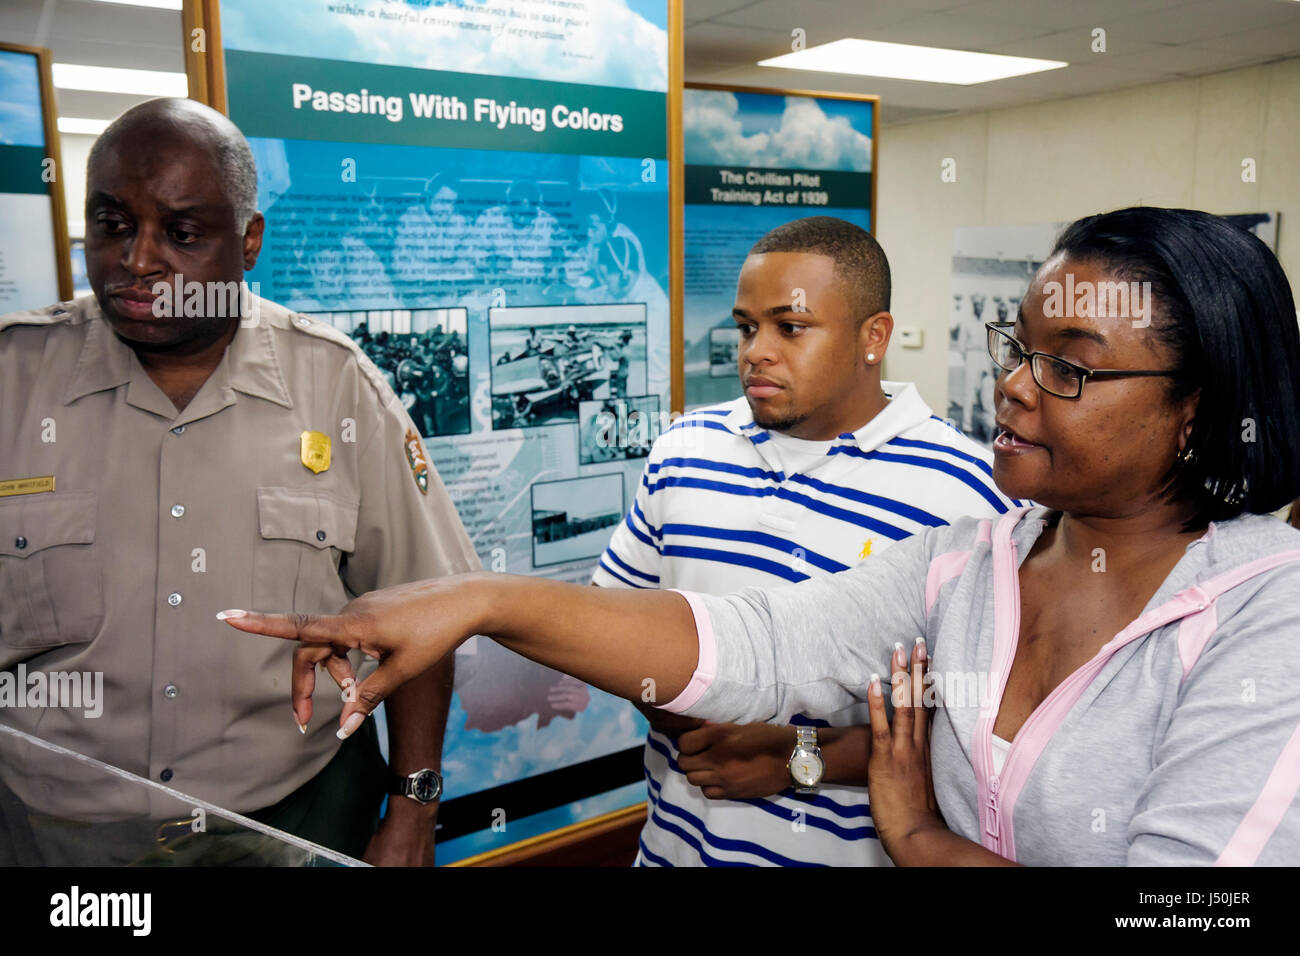 Alabama Tuskegee Black History Moton Airfield Tuskegee Airmen National Historic Site Black man tour guide woman - Stock Image